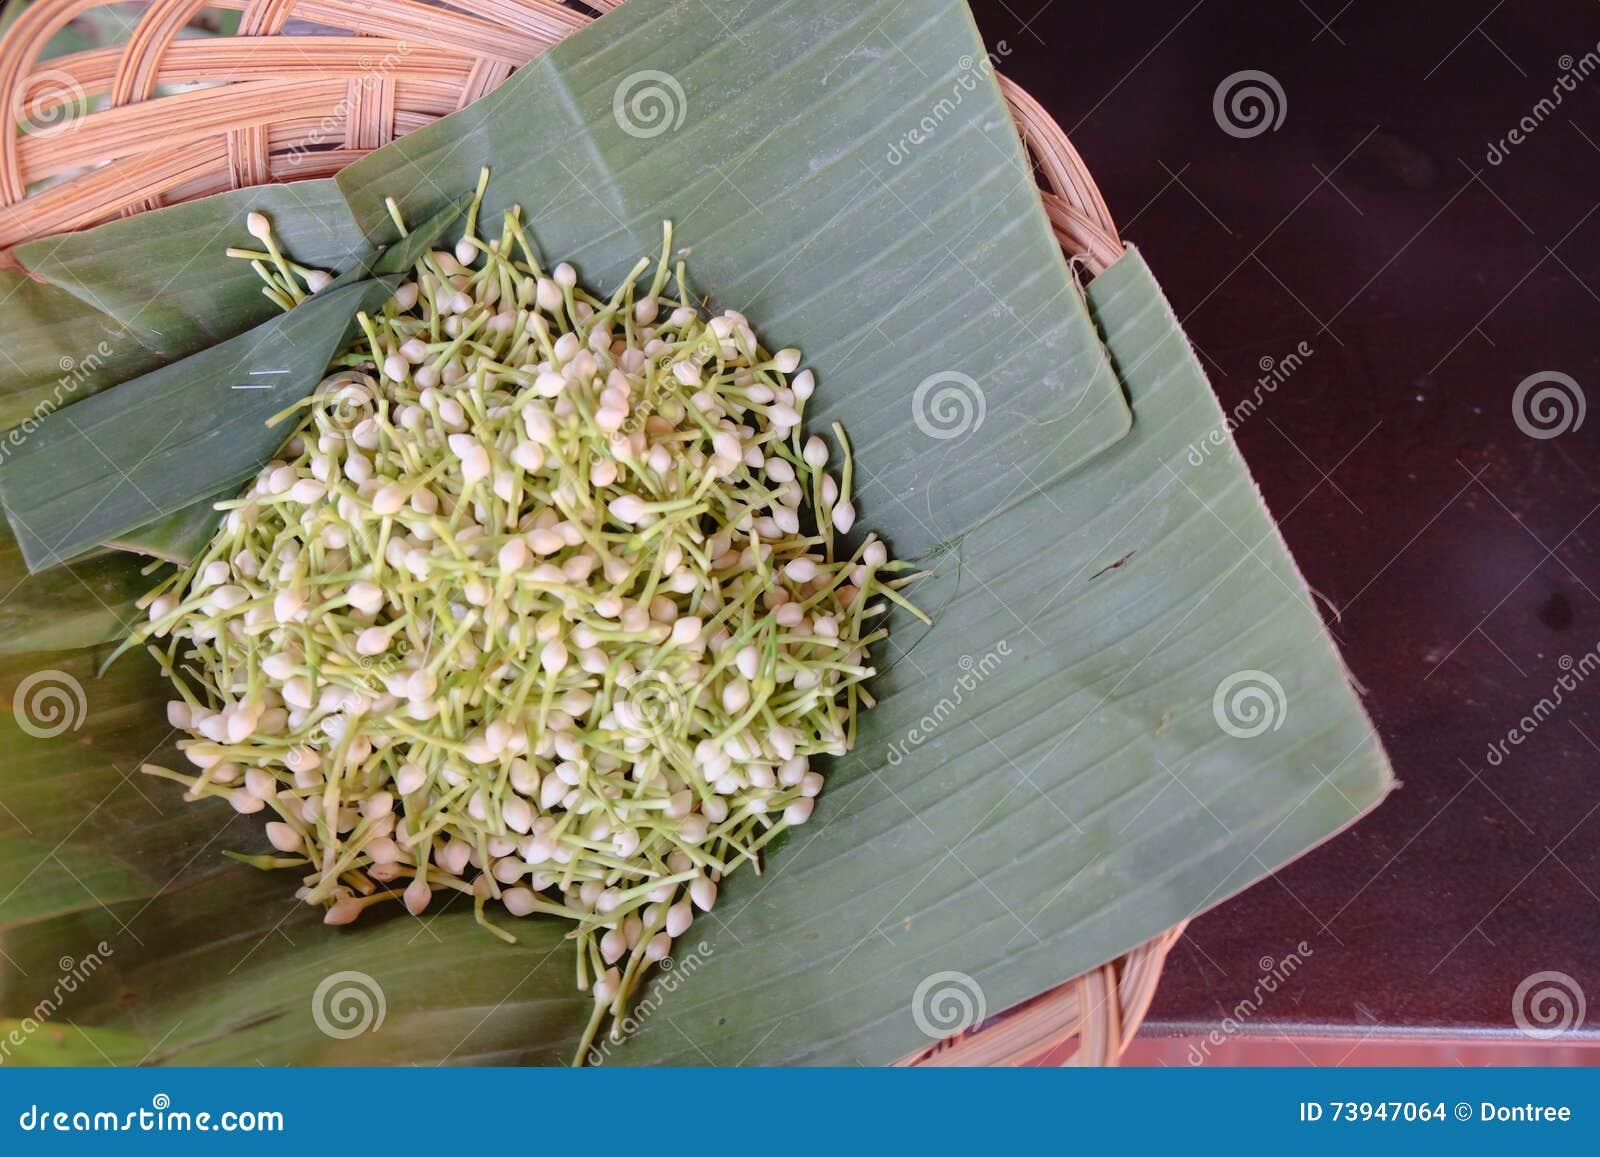 Jasmine Flower White For Make Garland Stock Photo Image Of